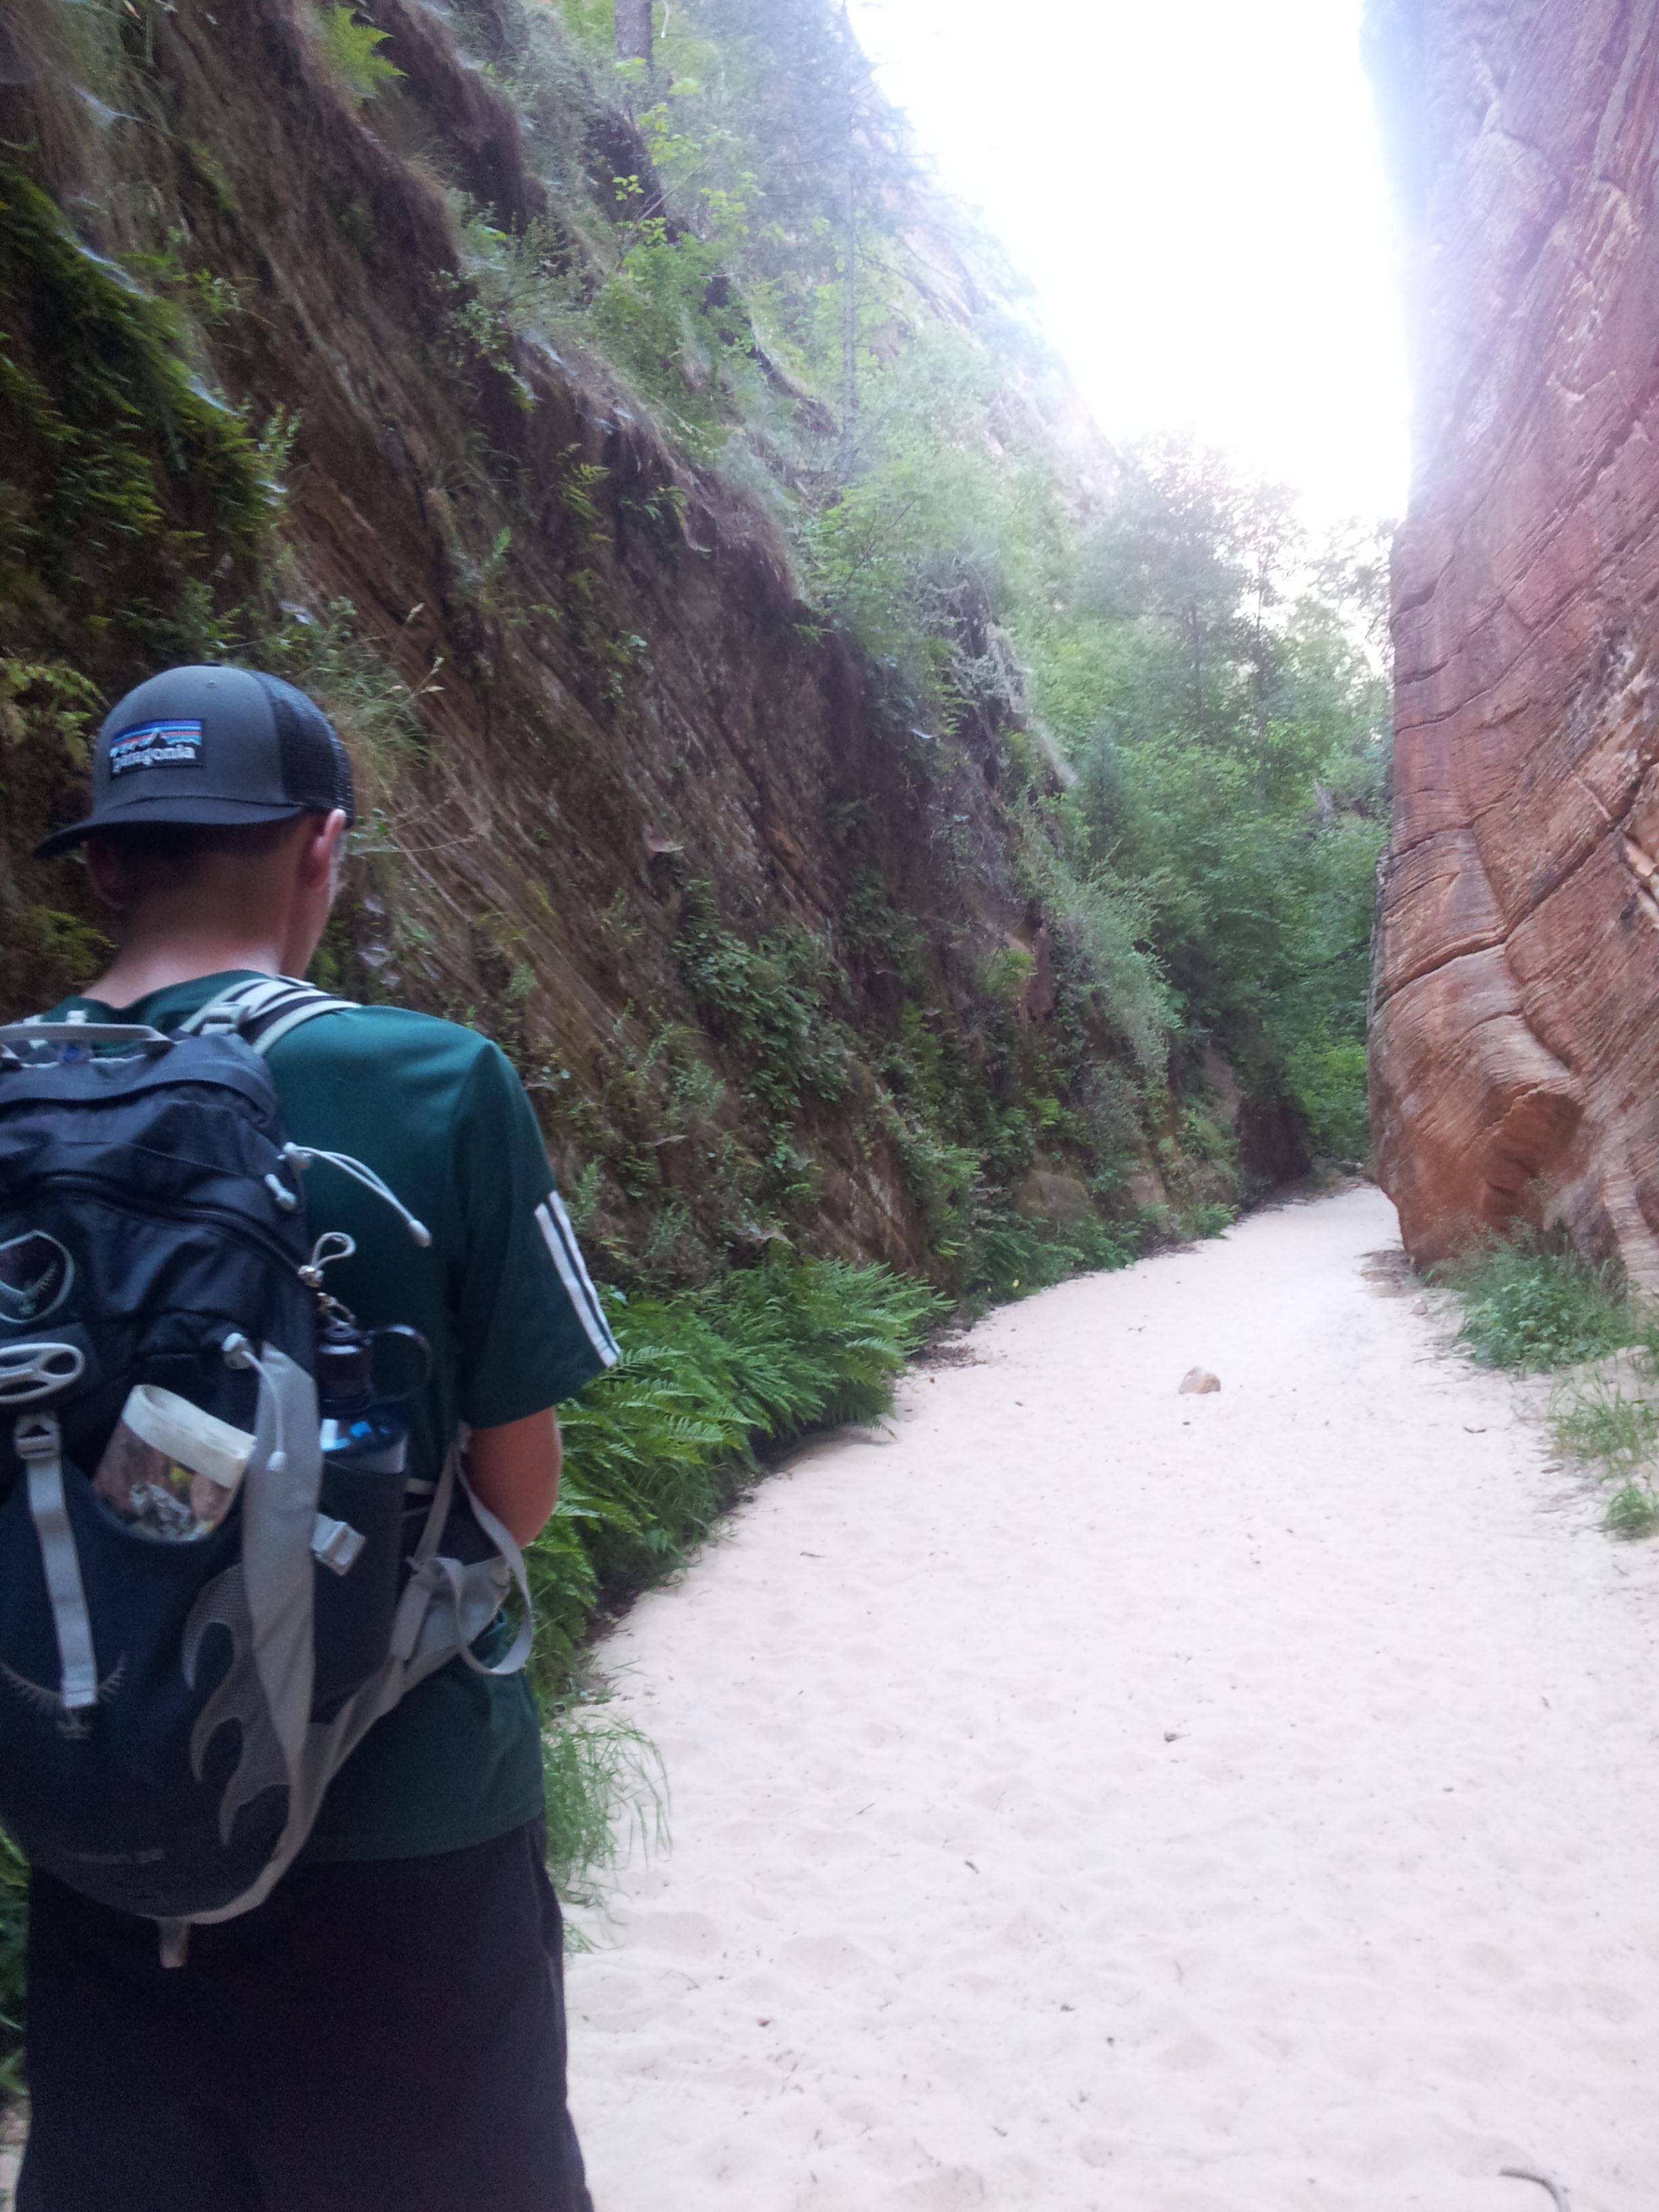 Entering the sandy canyon